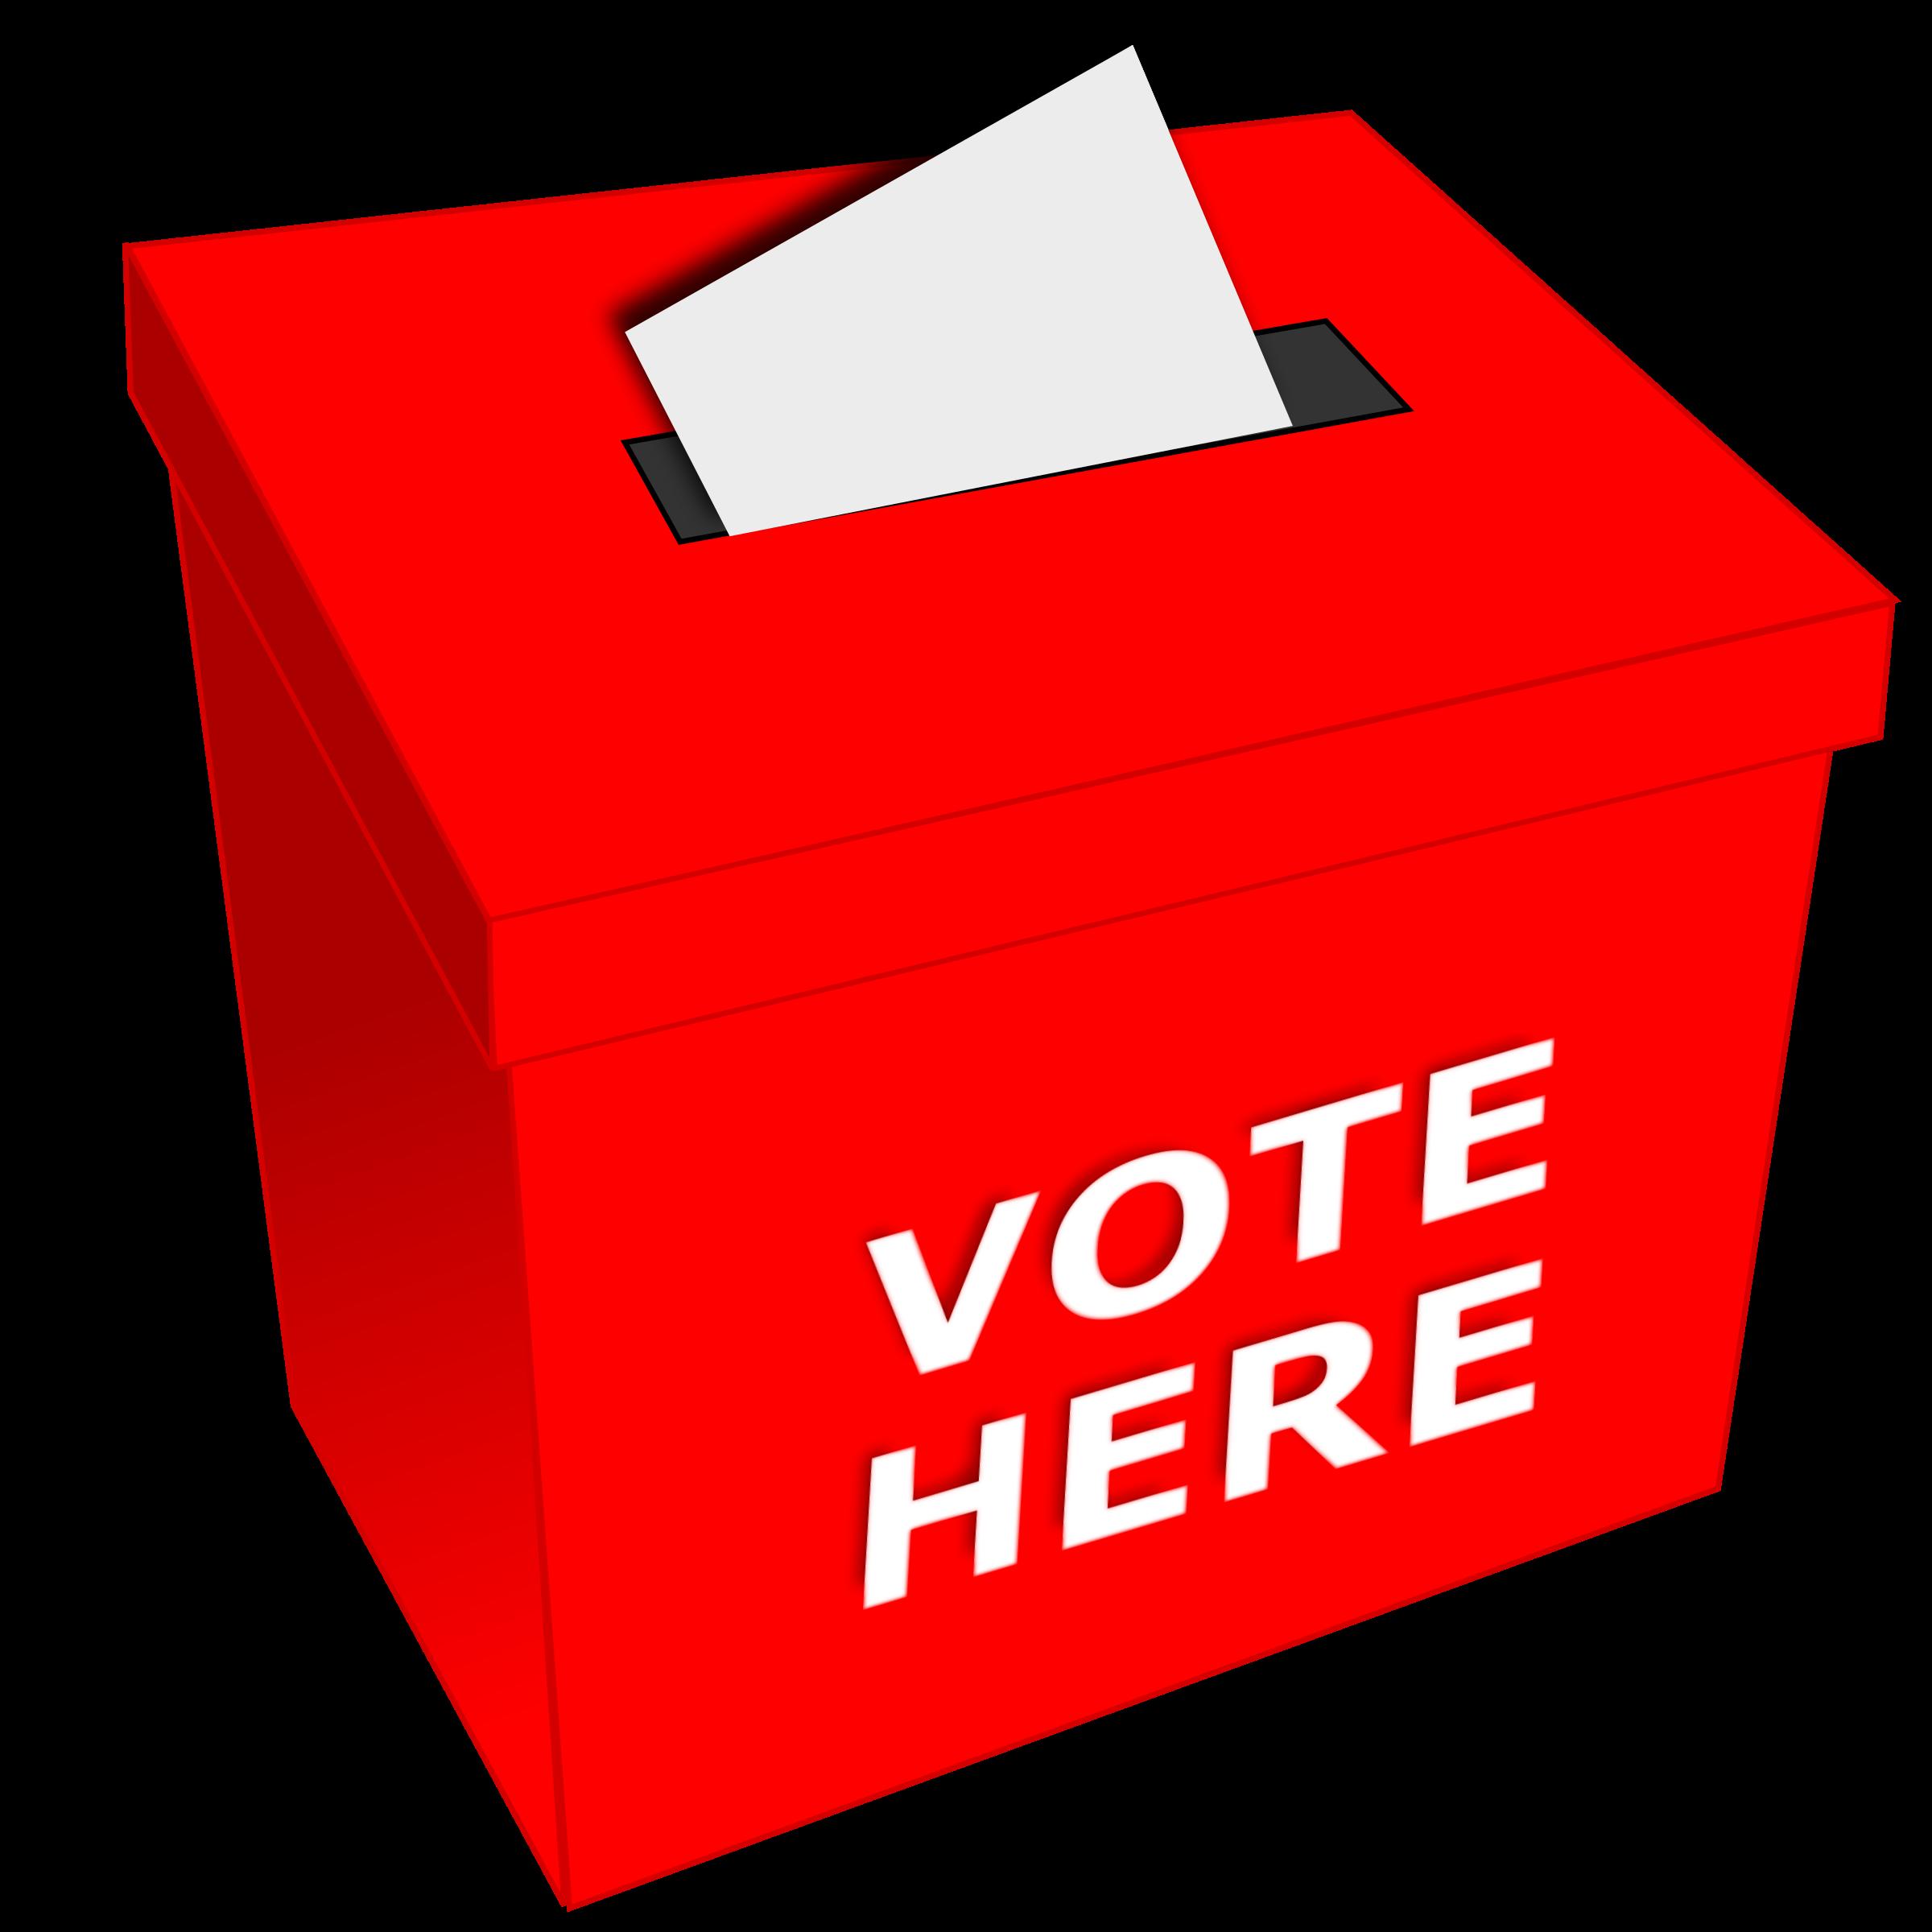 Raffle clipart raffle box. Vote big image png